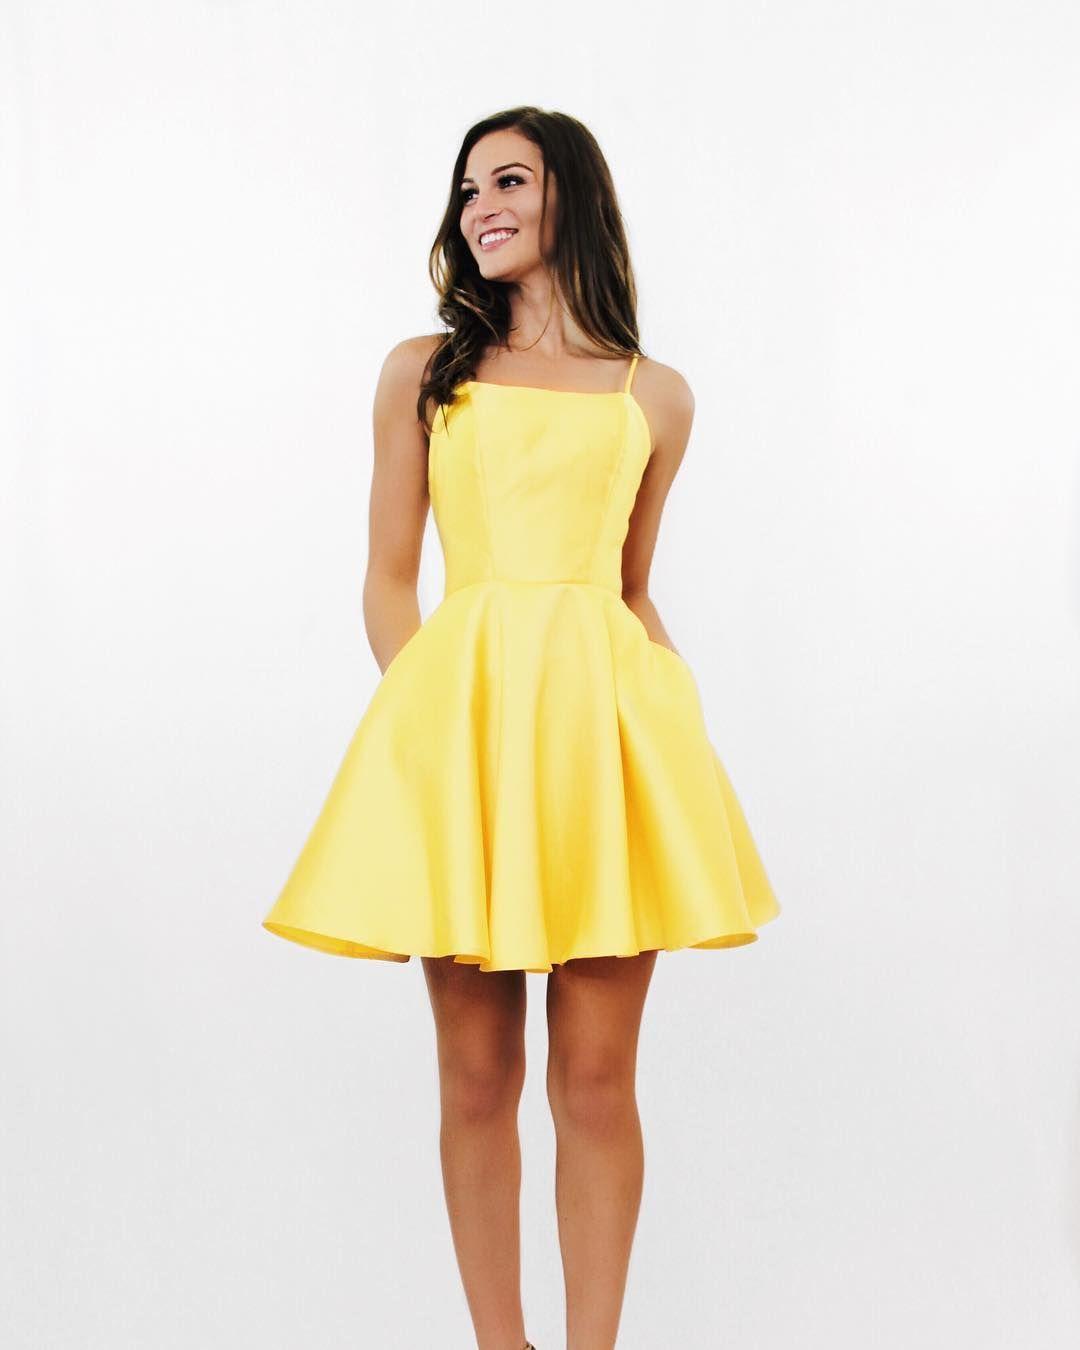 Yellow Spaghetti Strap Homecoming Dress Simple Short Satin Homecoming Yellow Homecoming Dresses Short Red Prom Dresses Prom Dresses Yellow [ 1350 x 1080 Pixel ]